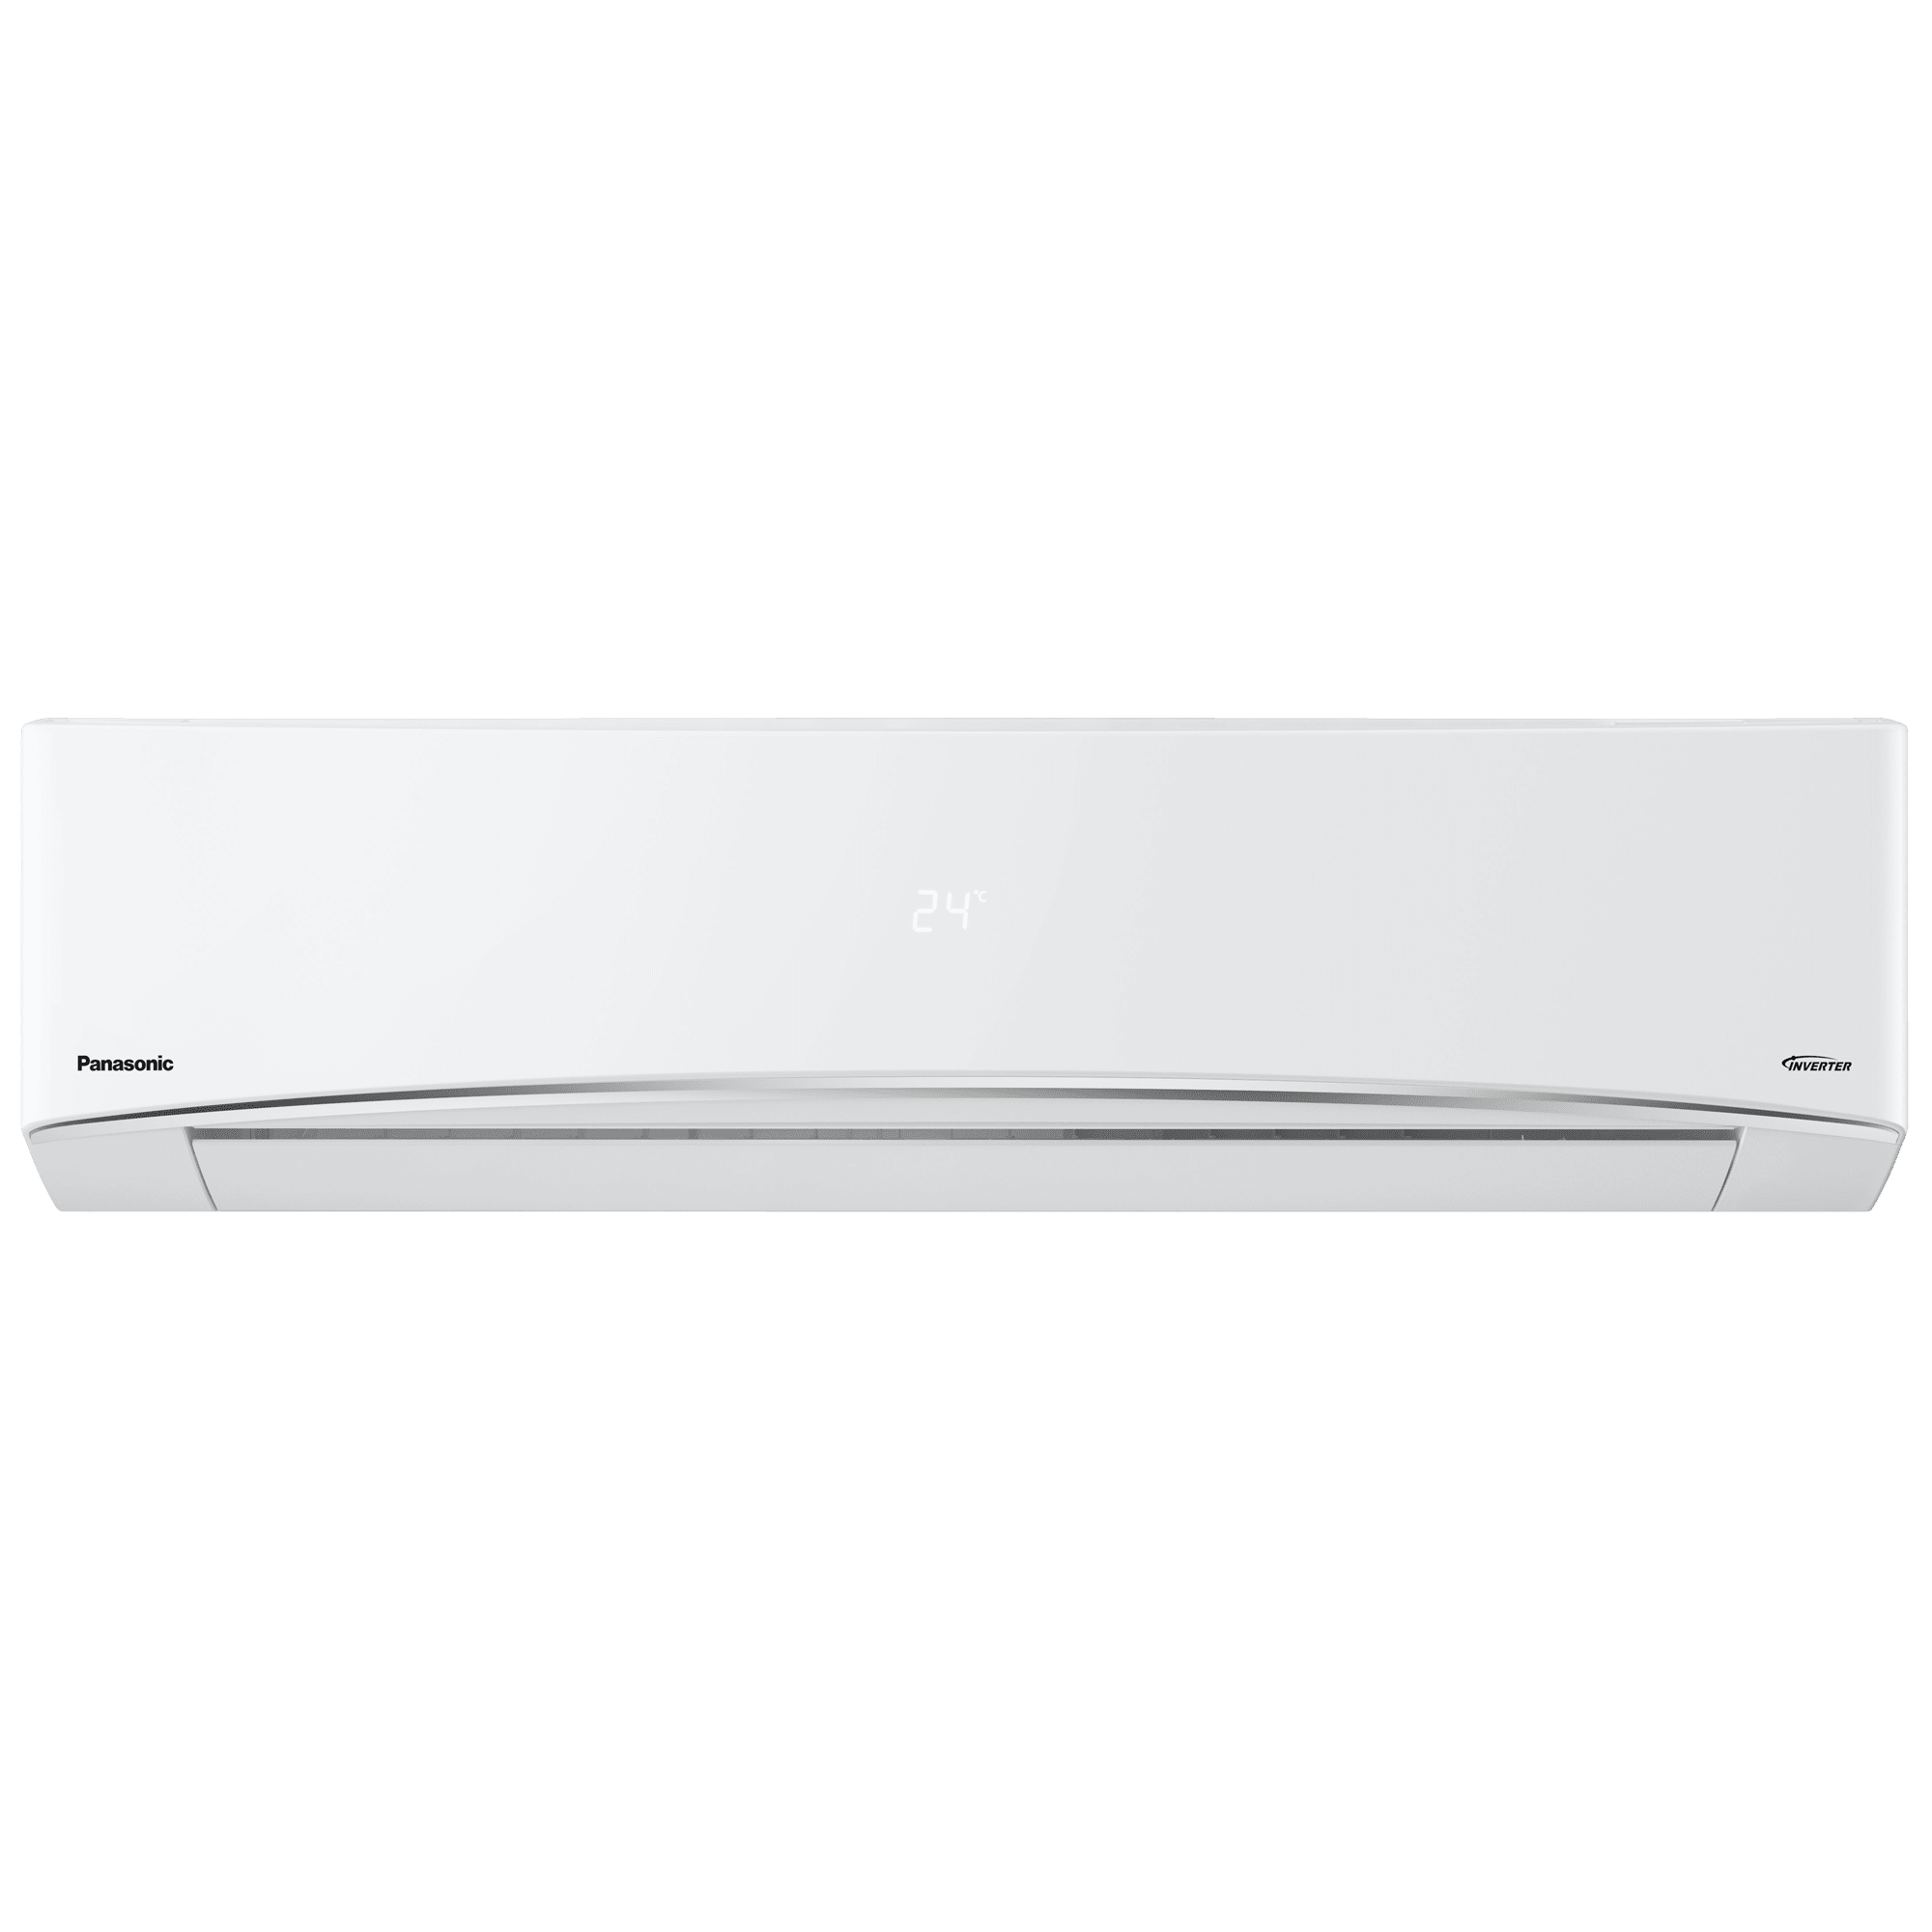 Panasonic KU 1.5 Ton 3 Star Inverter Split AC (Air Purification Function, Wi-Fi, Copper Condenser, CS/CU-KU18XKYTF, White)